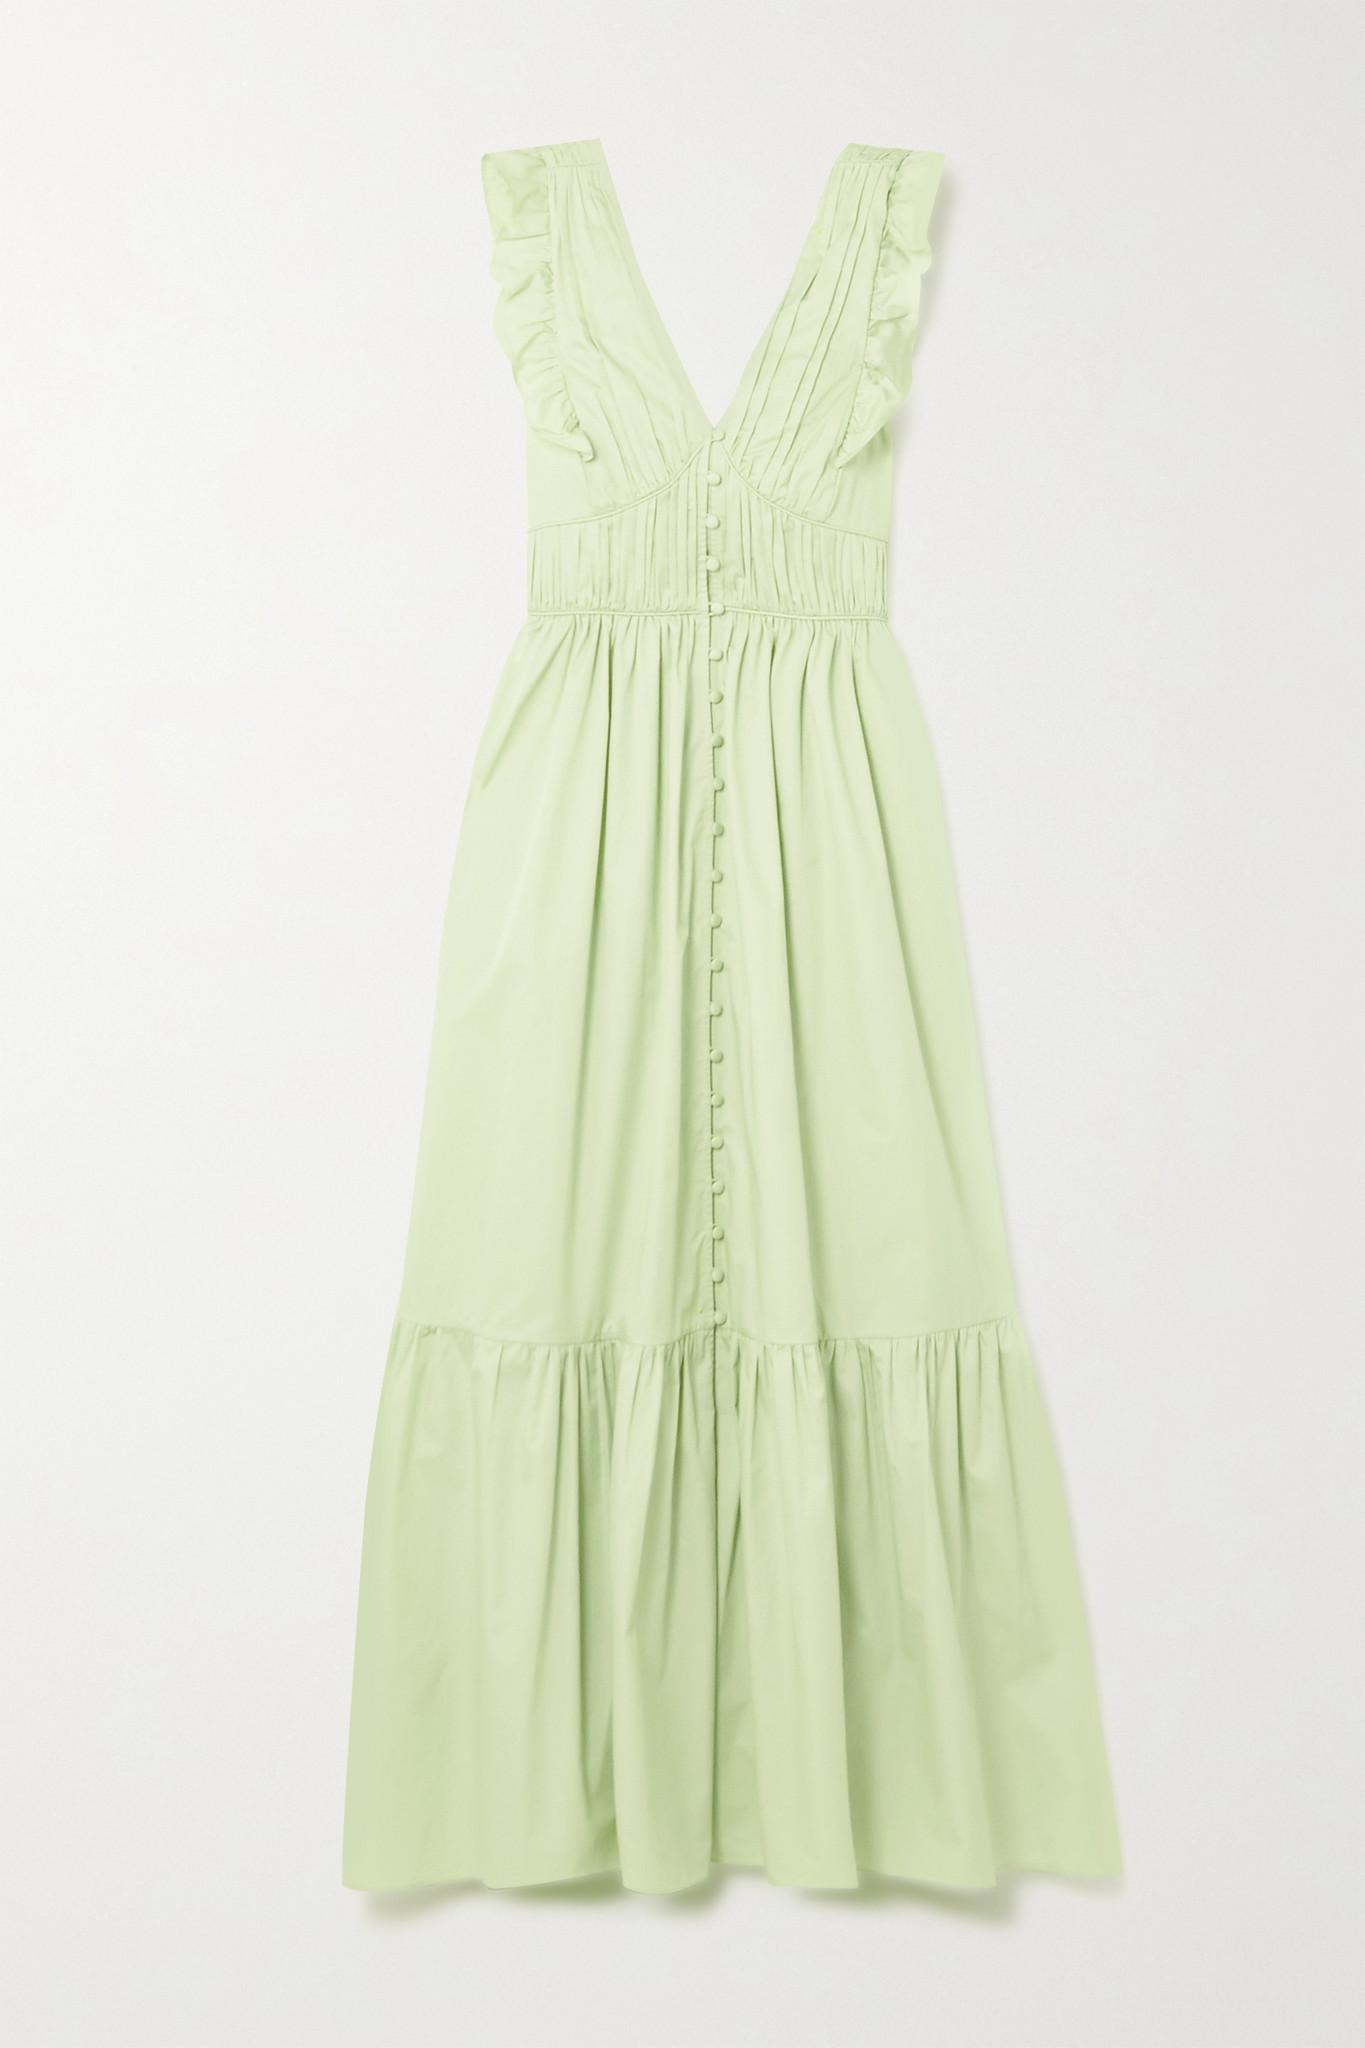 SELF-PORTRAIT - 背面系带荷叶边纯棉府绸超长连衣裙 - 绿色 - UK10